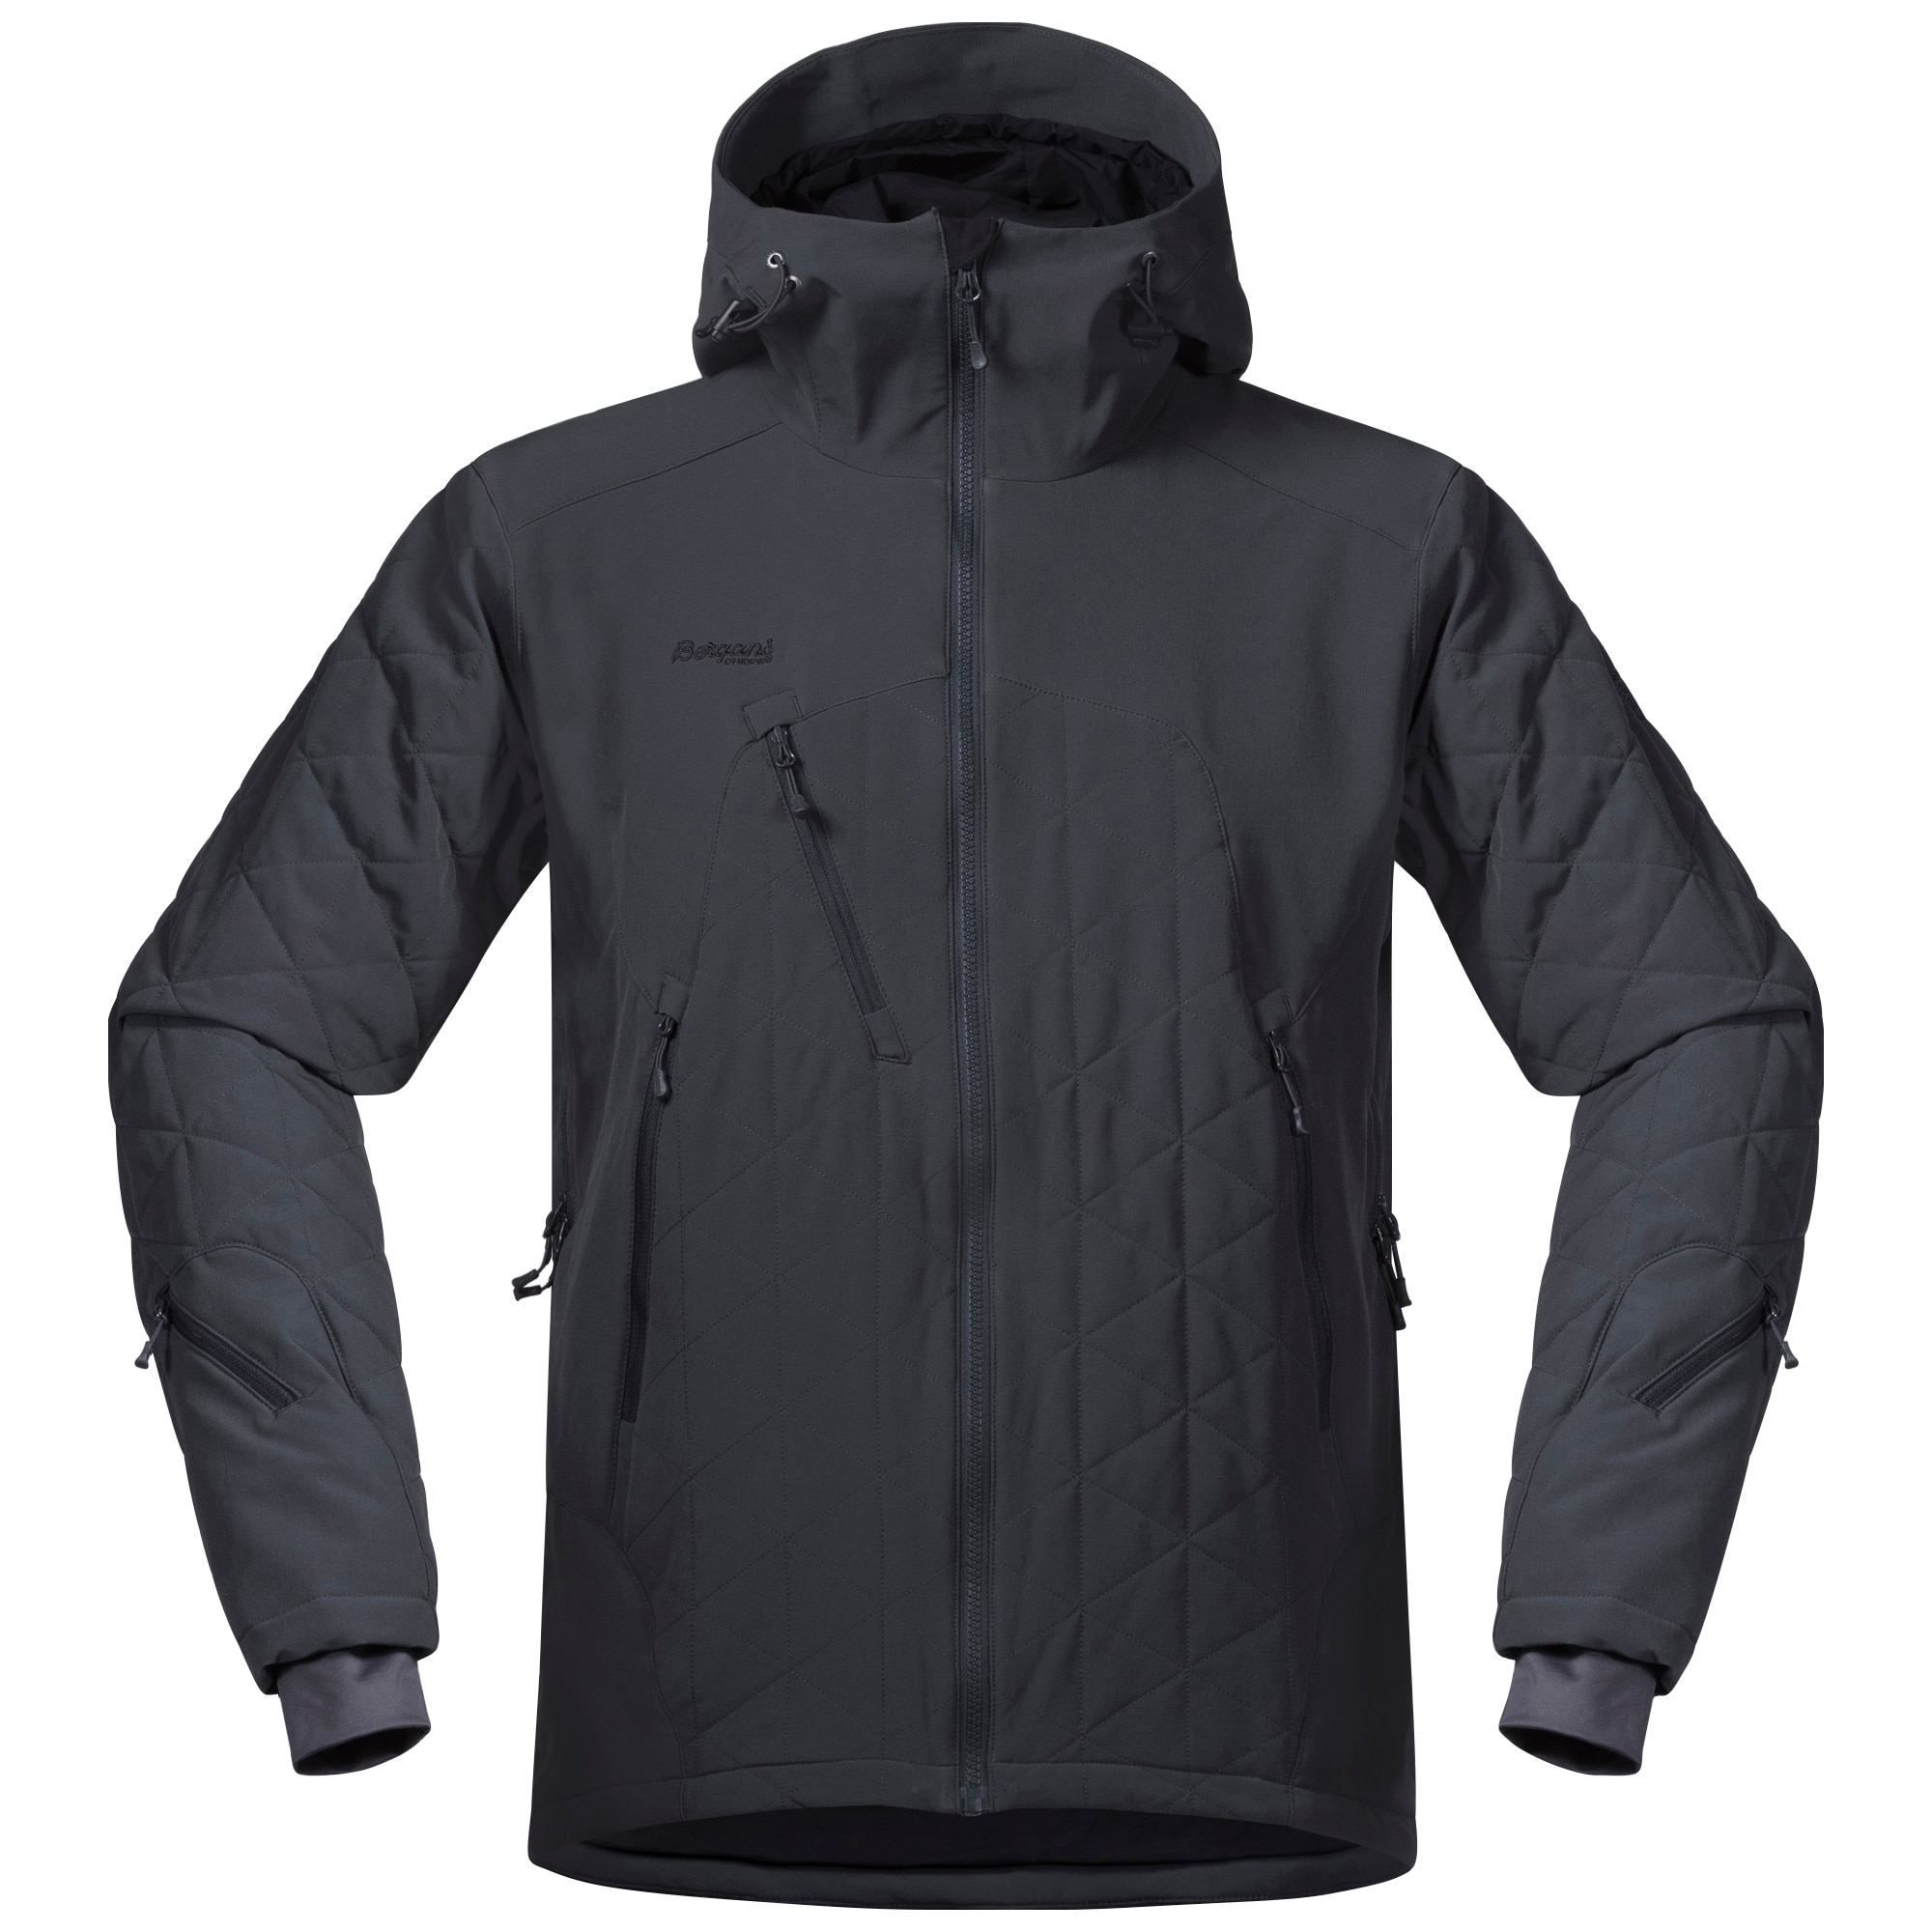 Kongsberg Insulated Jacket